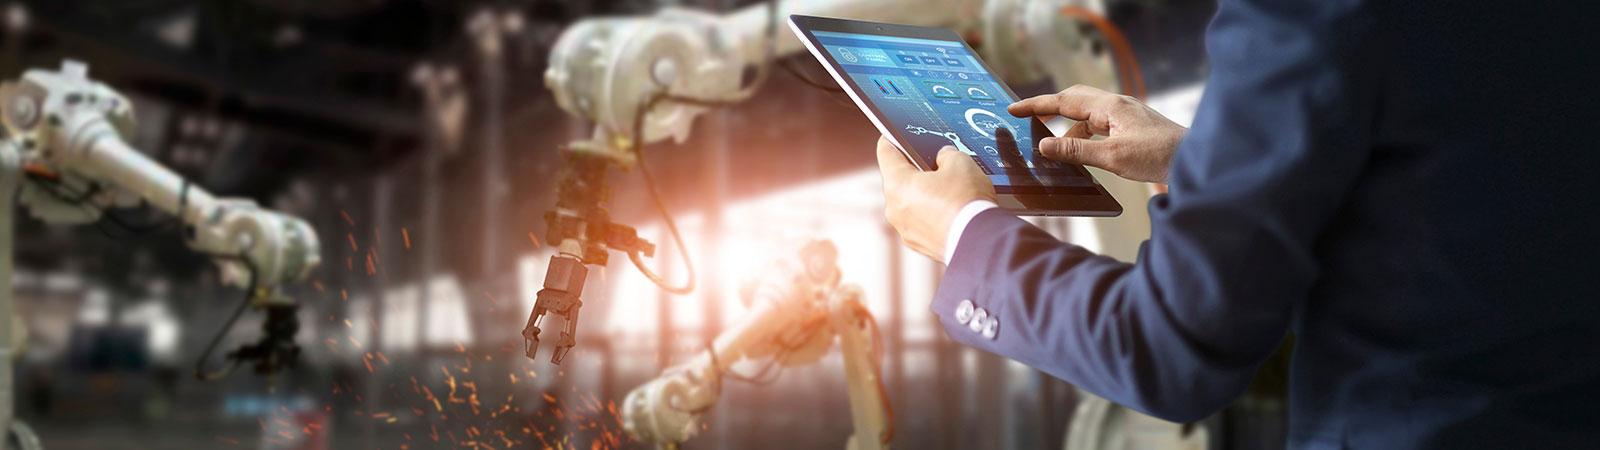 digital transformation in logistics